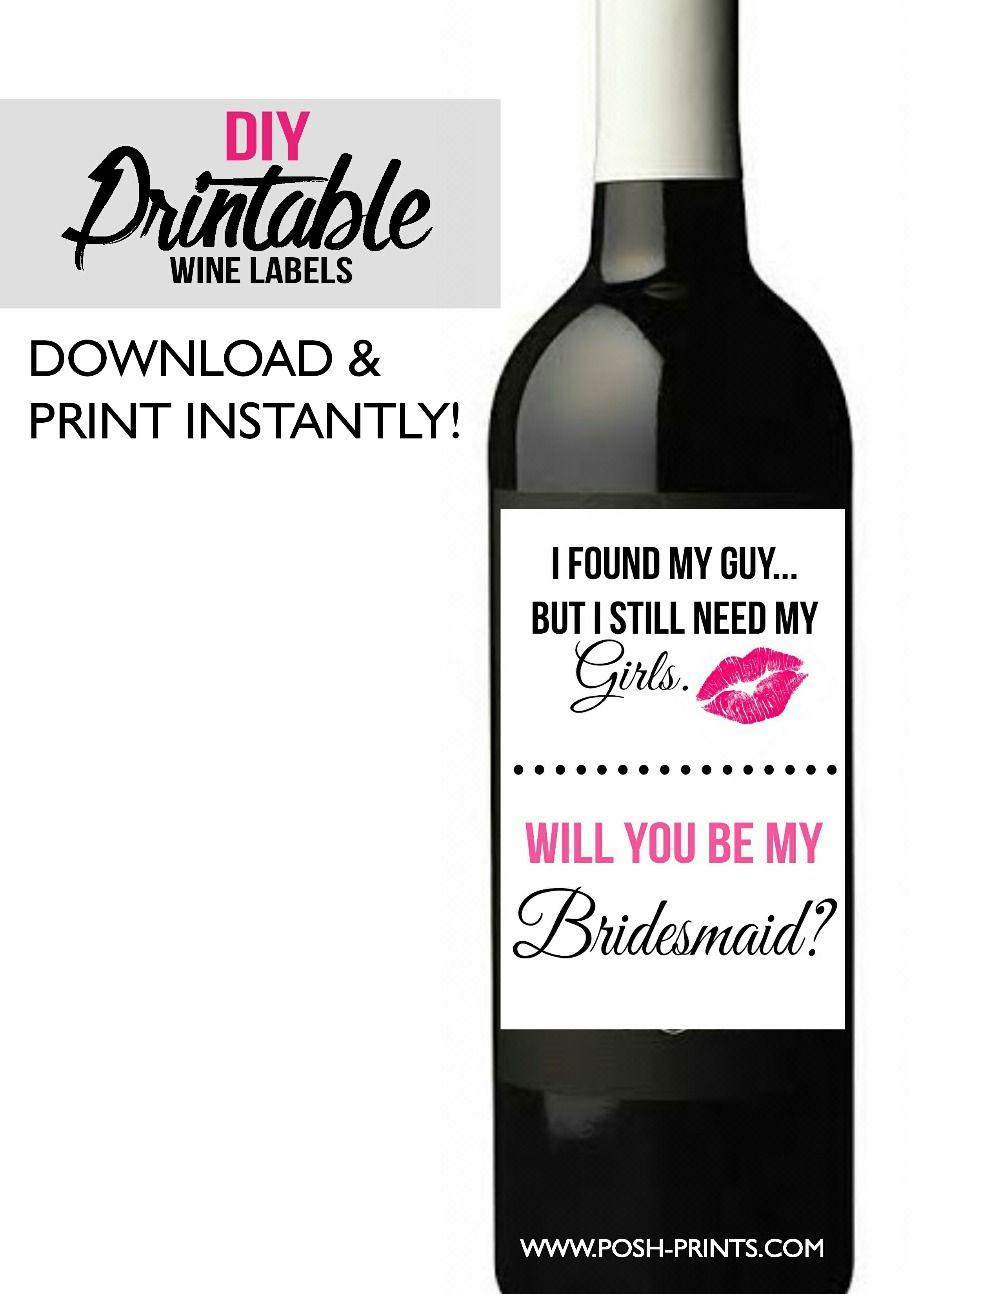 Printable Wine Label Wine Label Printable Diy Wine Labels Labels Free printable wine labels template